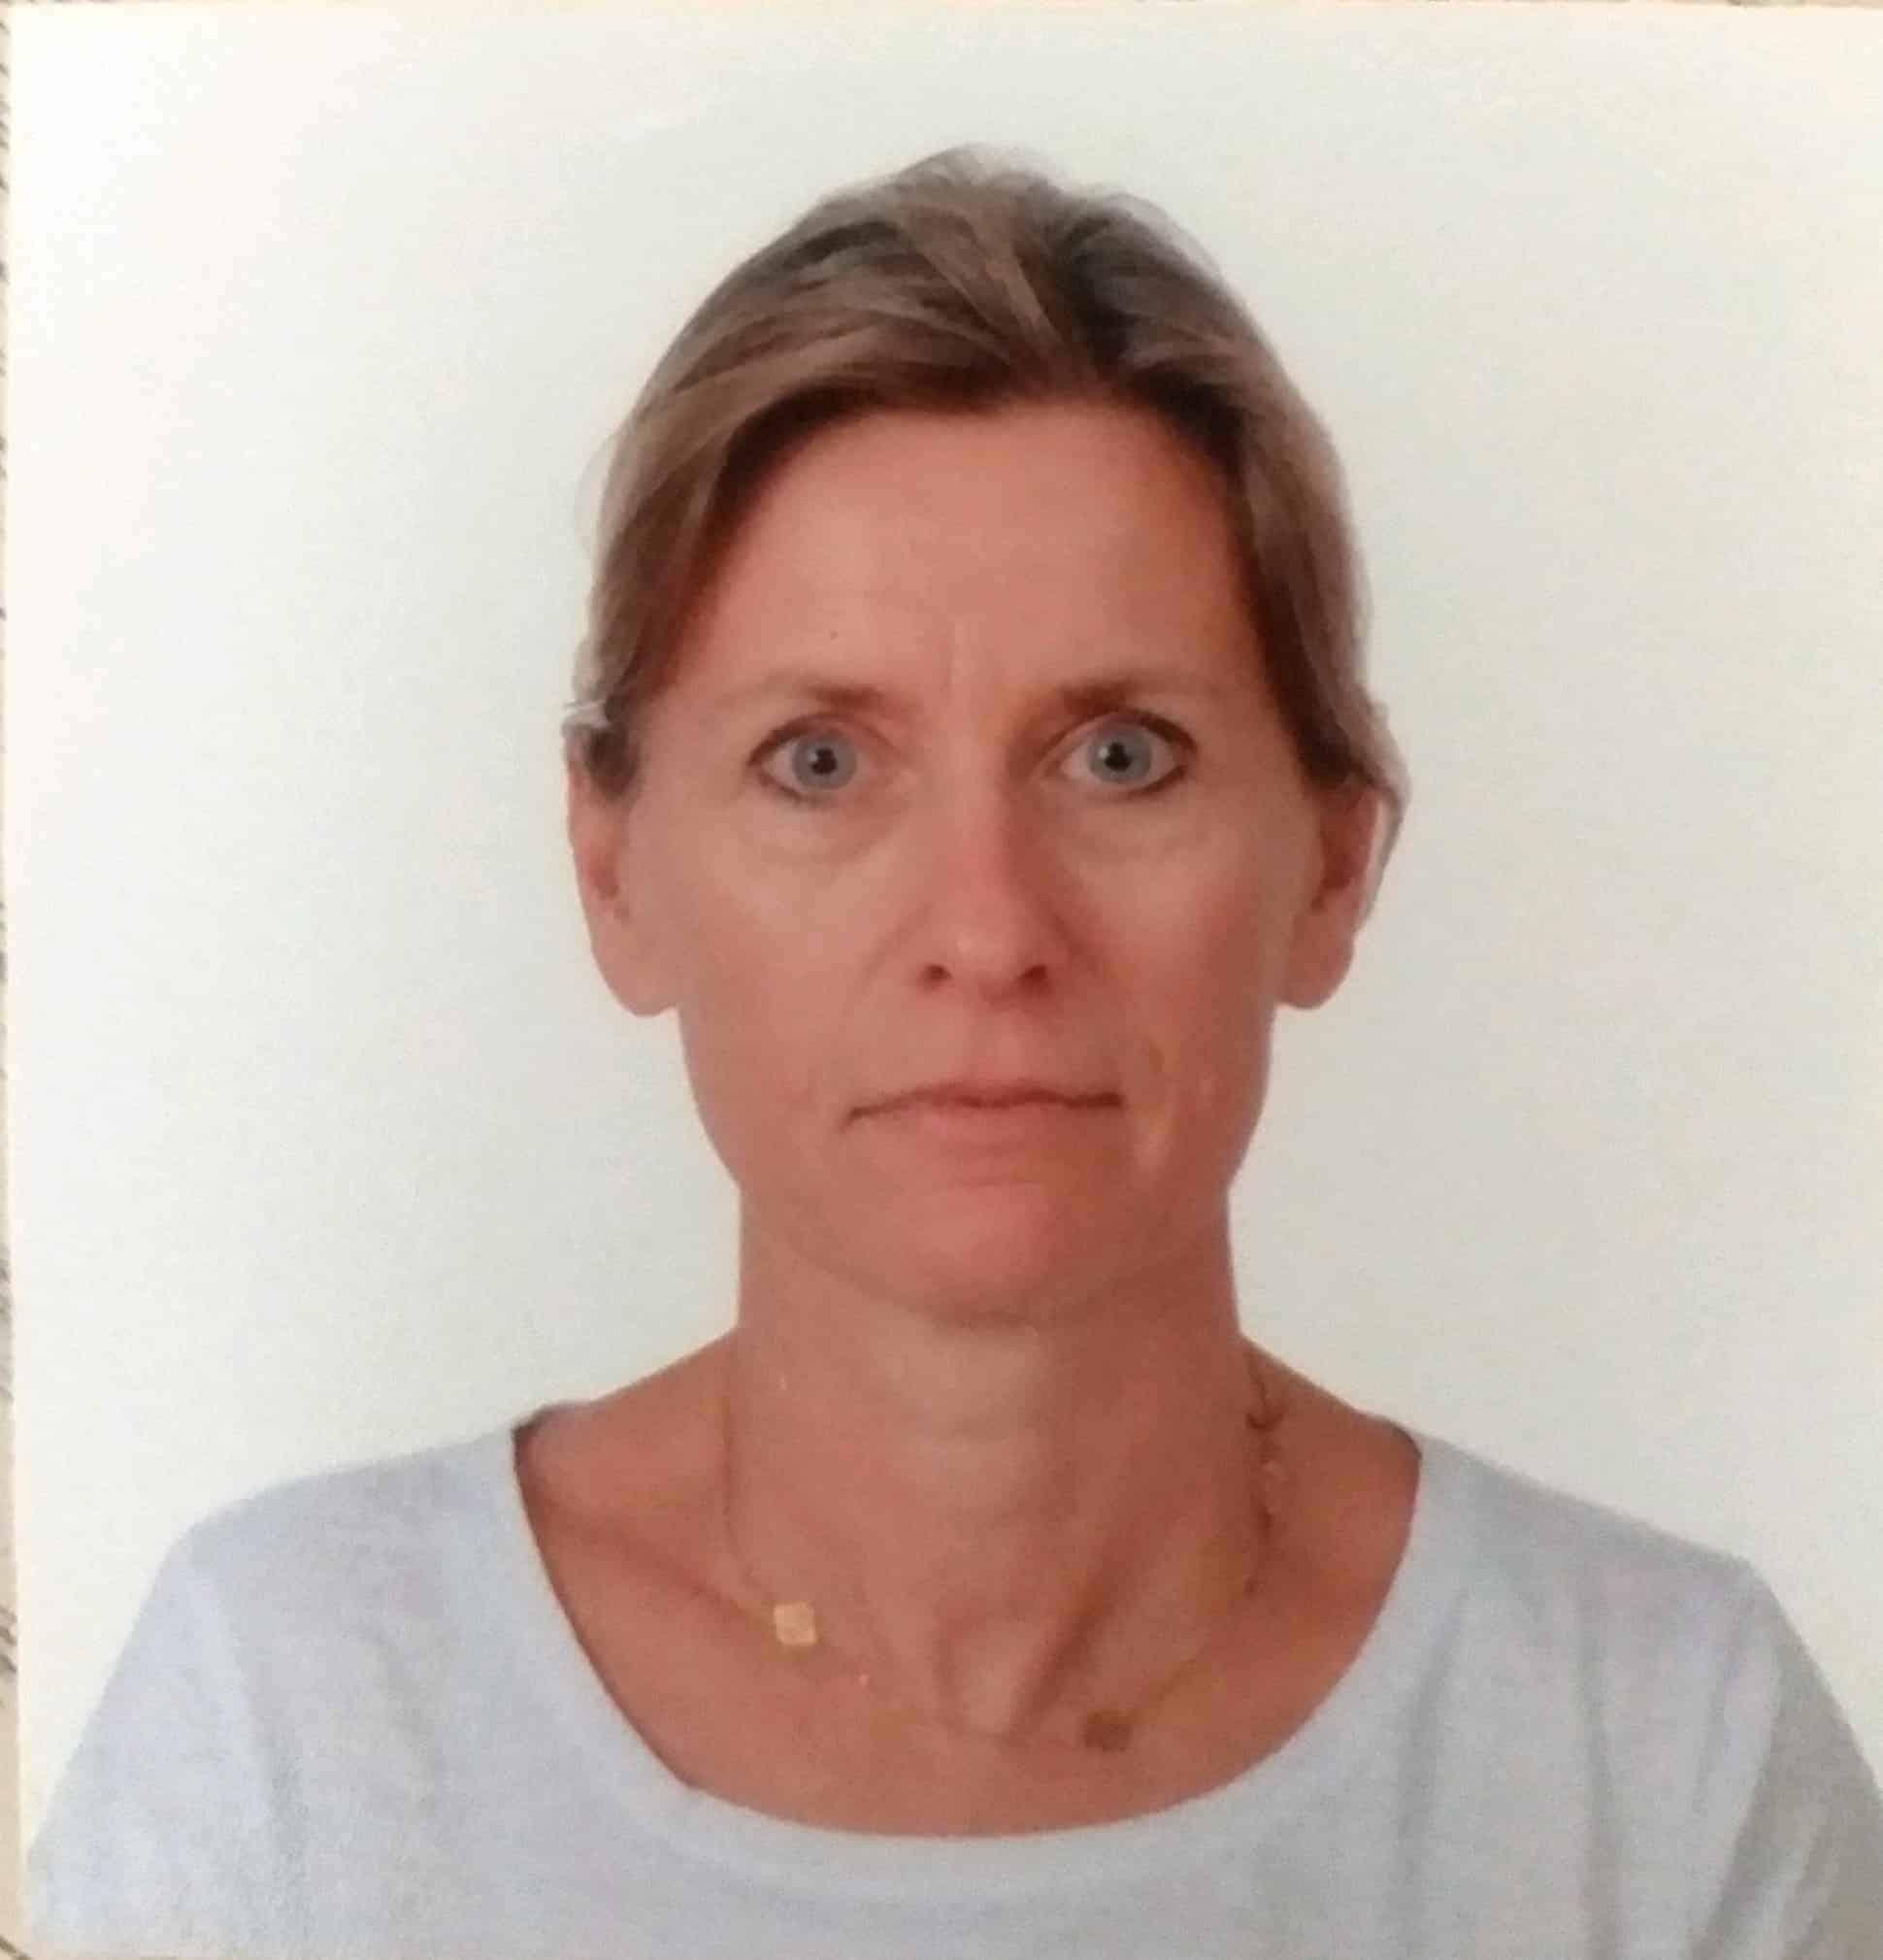 Dorothée Minne